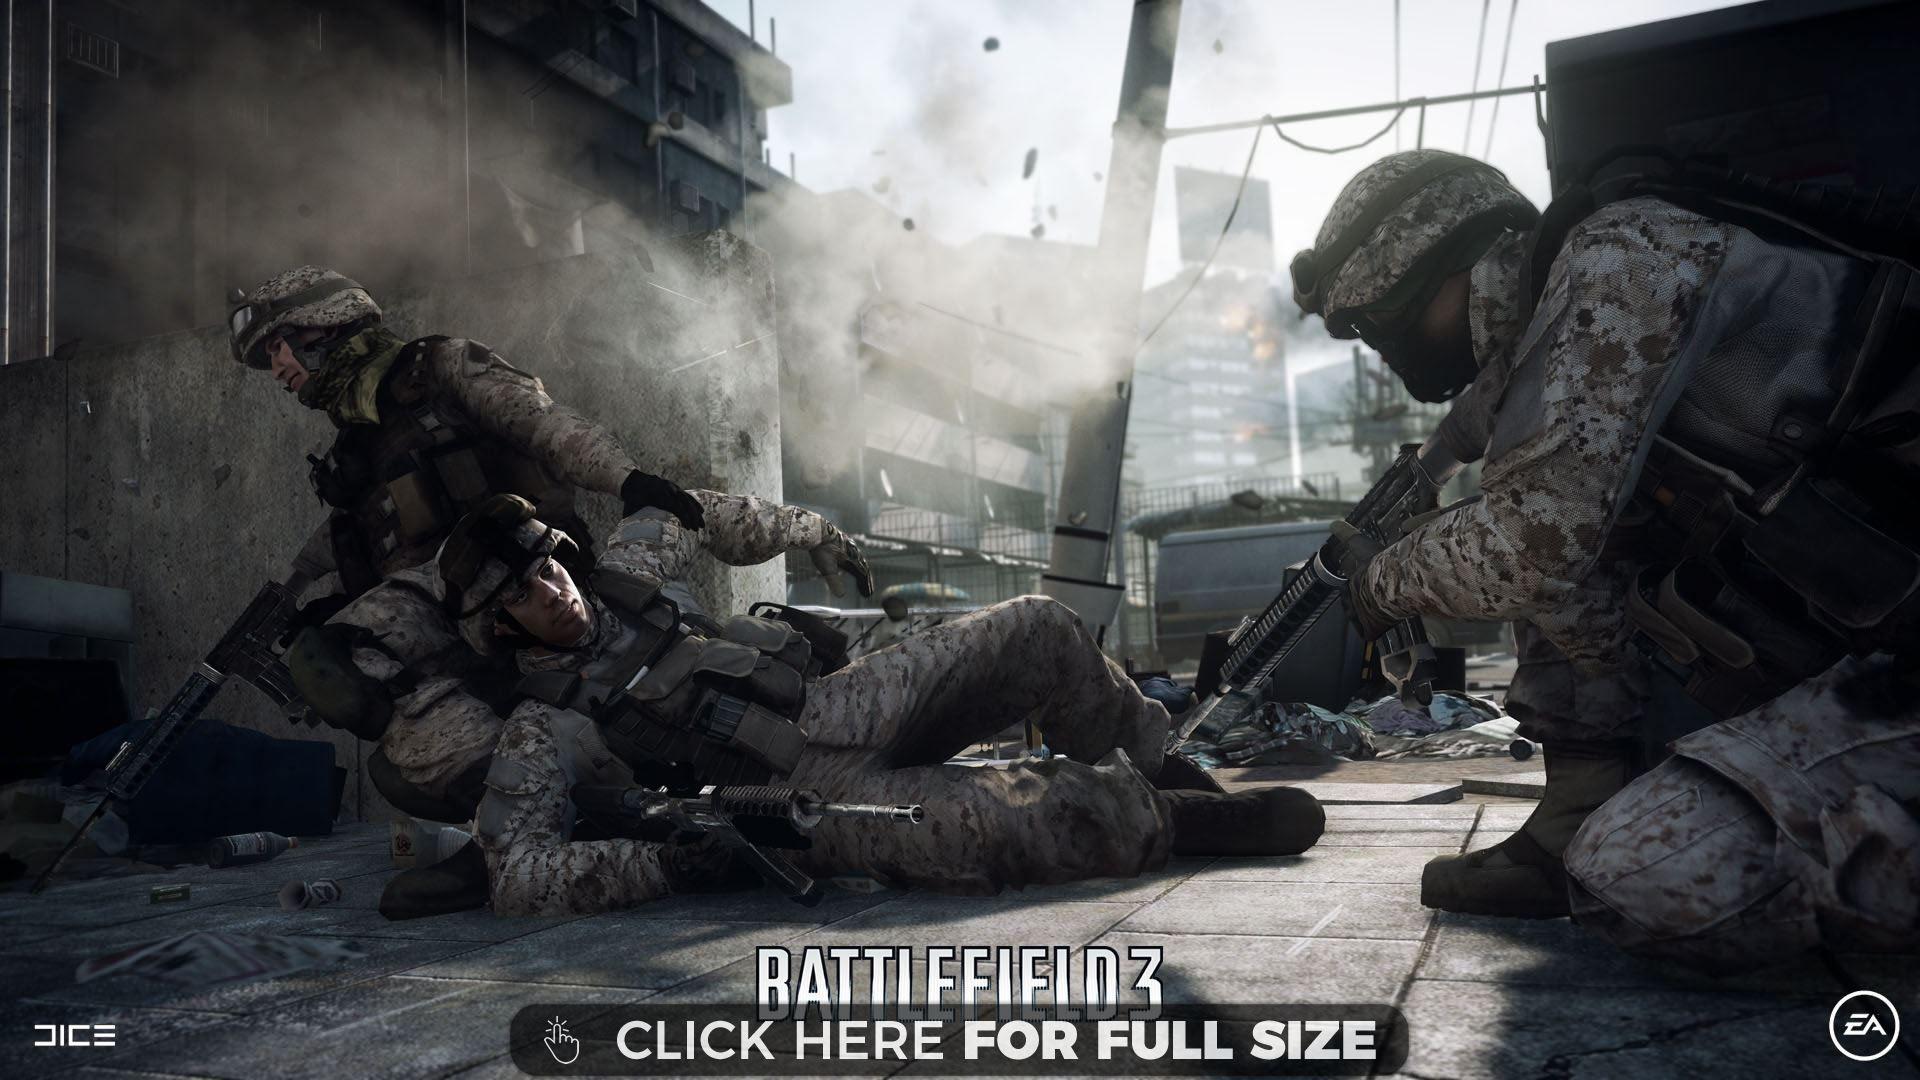 Battlefield 3 12251 Battlefield 3 Battlefield Army Wallpaper